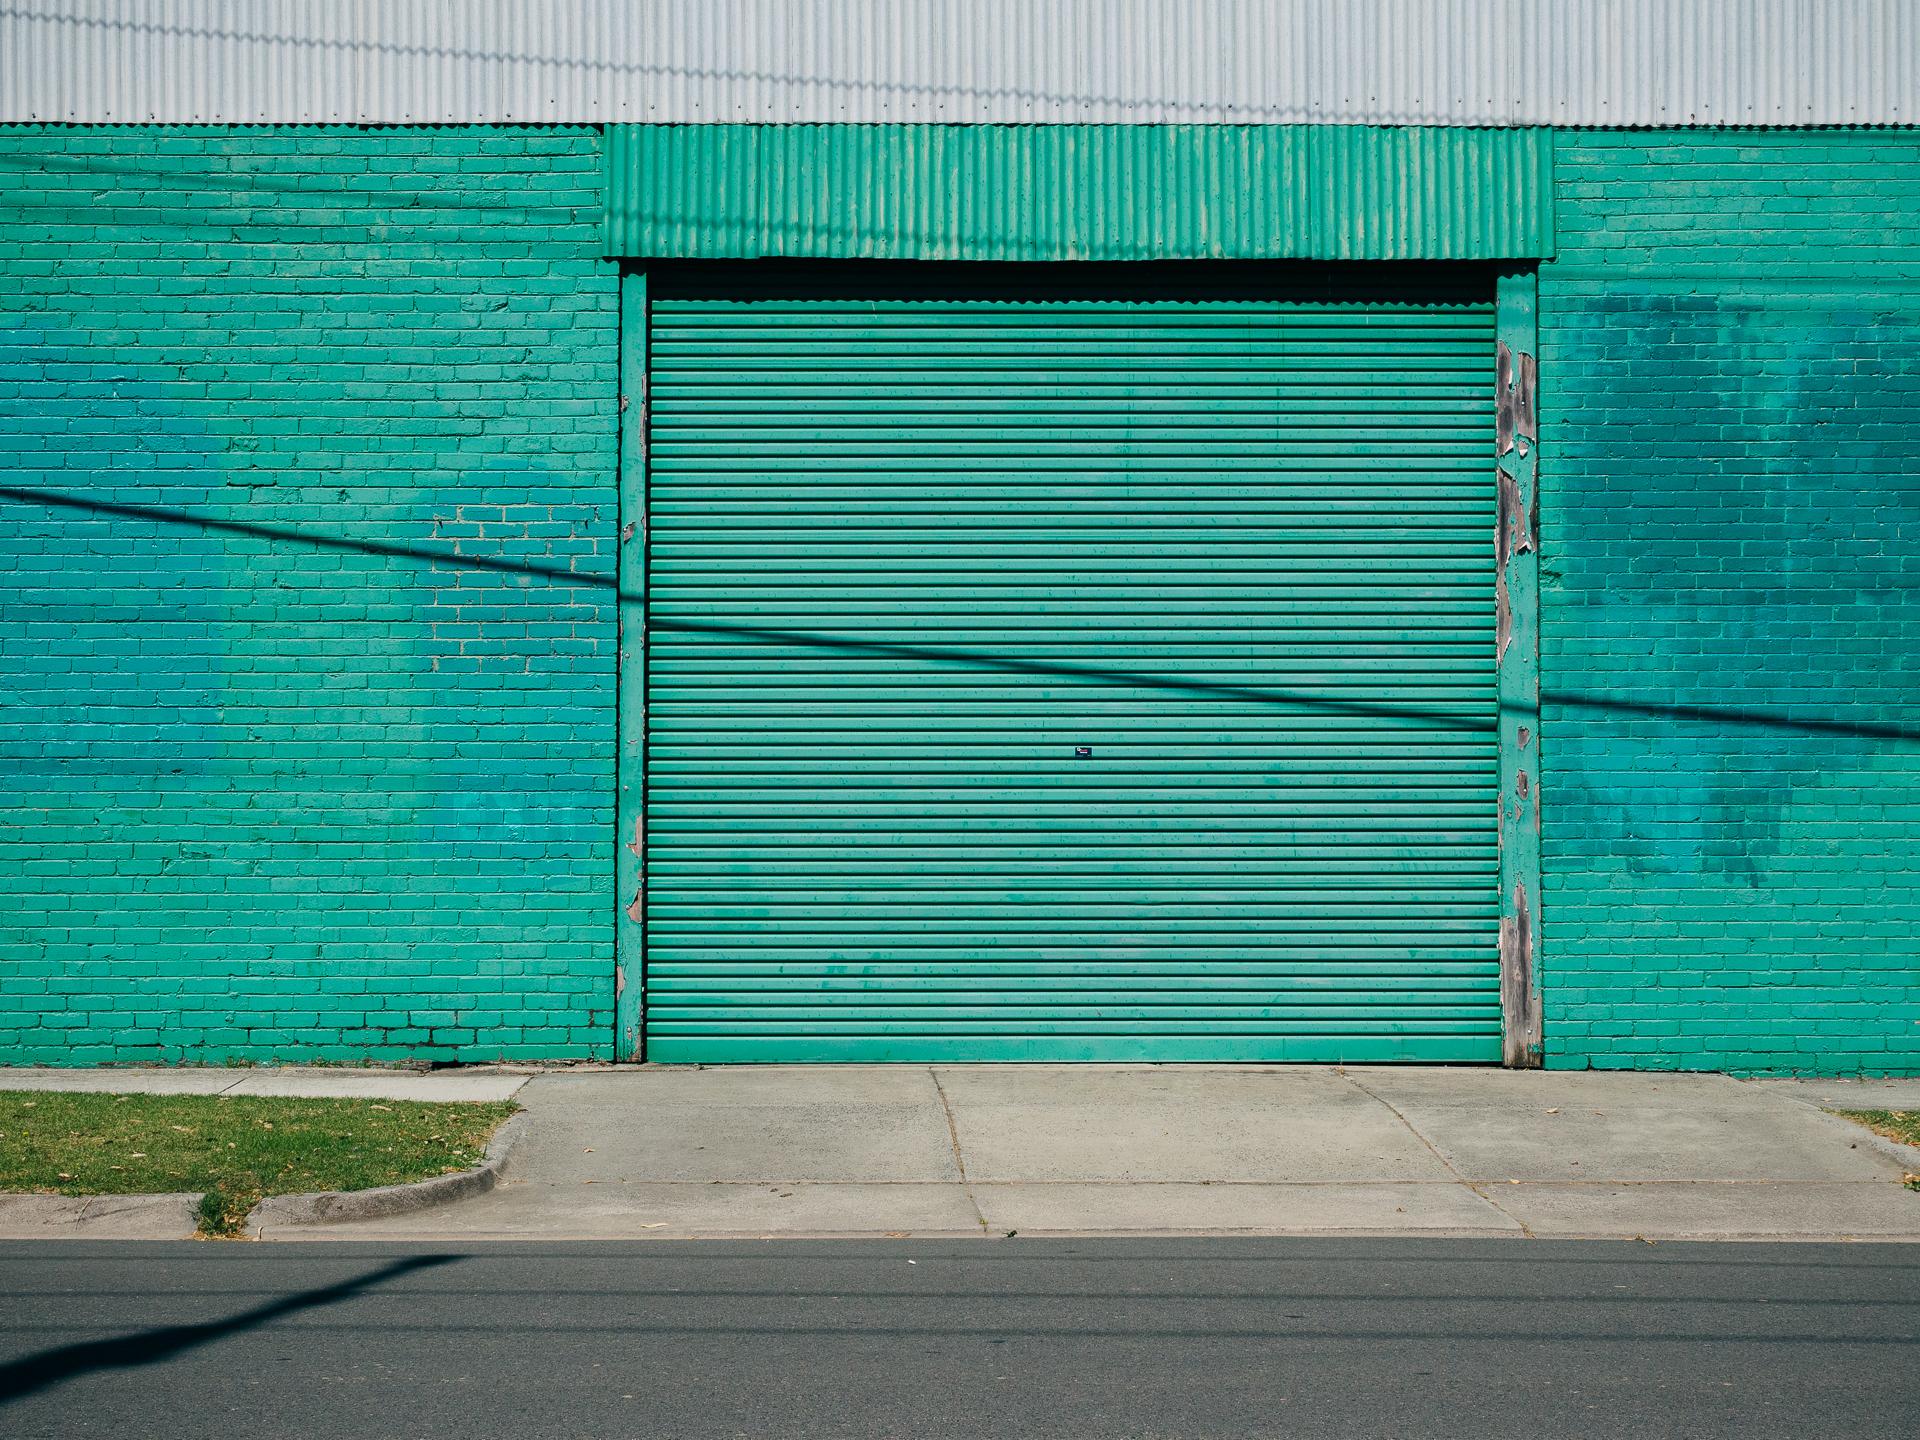 Wallpaper : peterbartlett, vsco, Australia, city, colour, dandenong